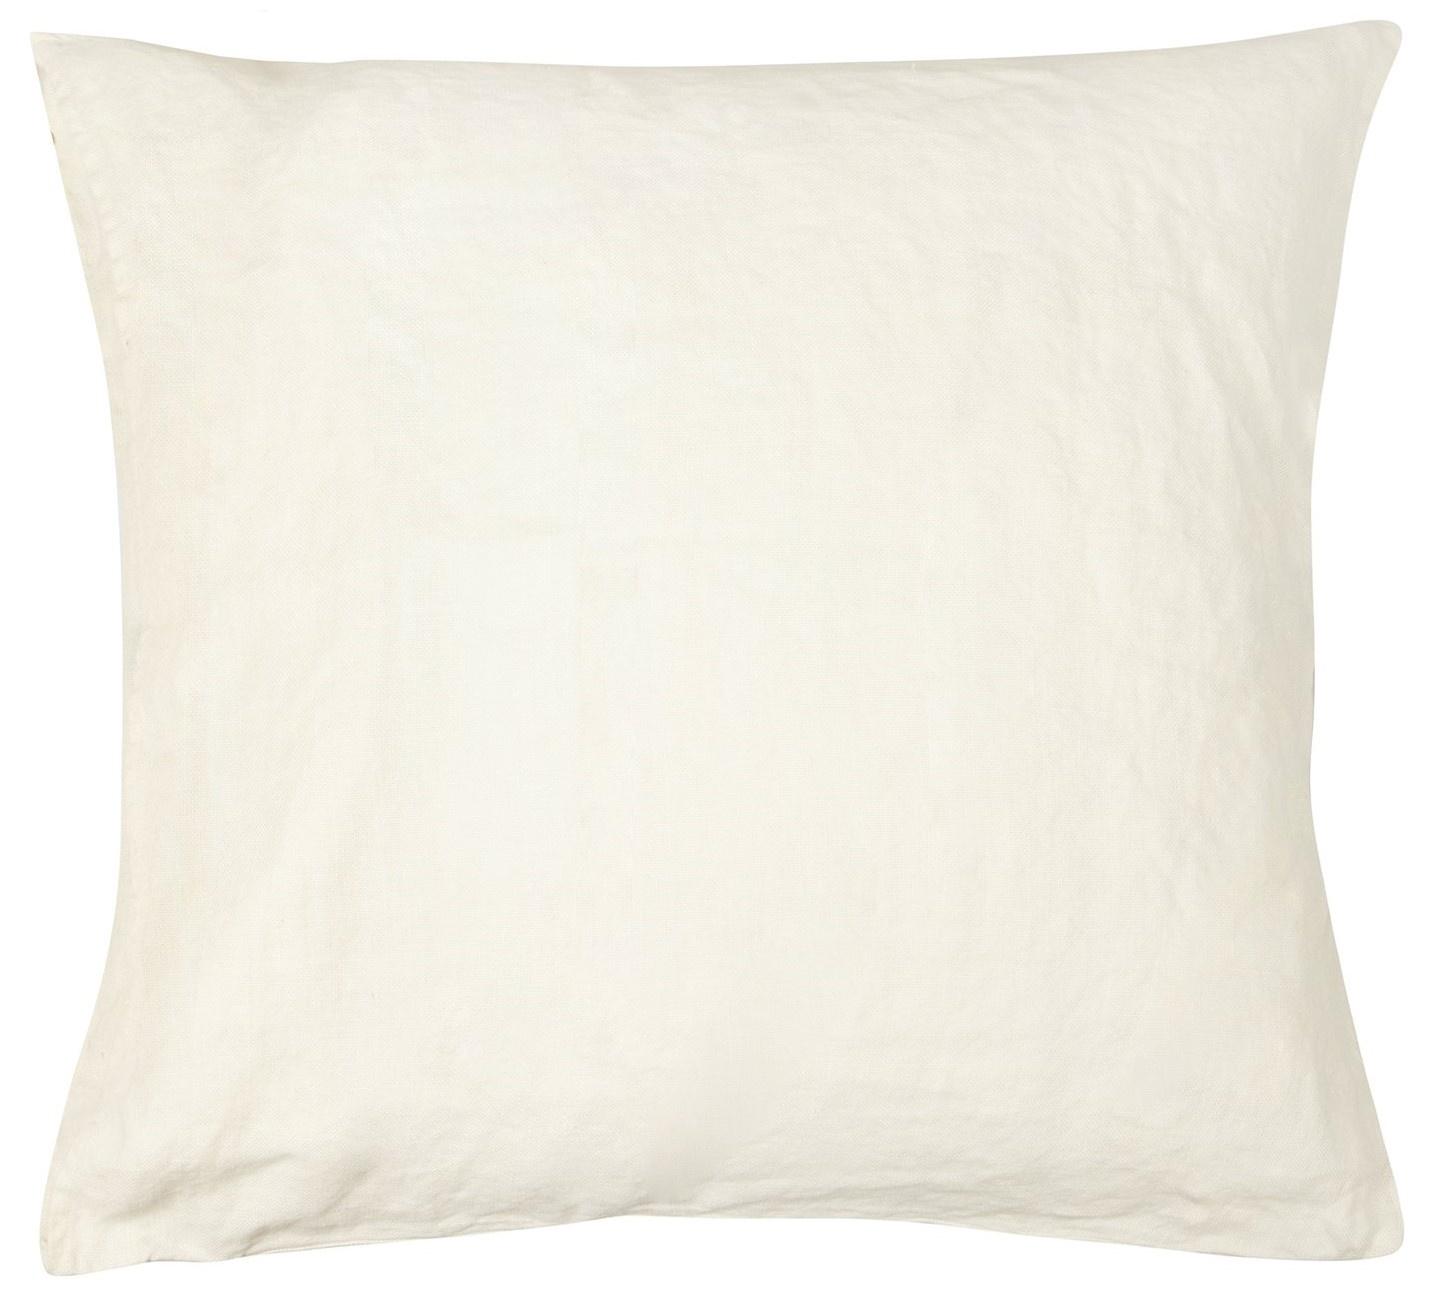 Kussenhoes Linen pillow square winter white-2